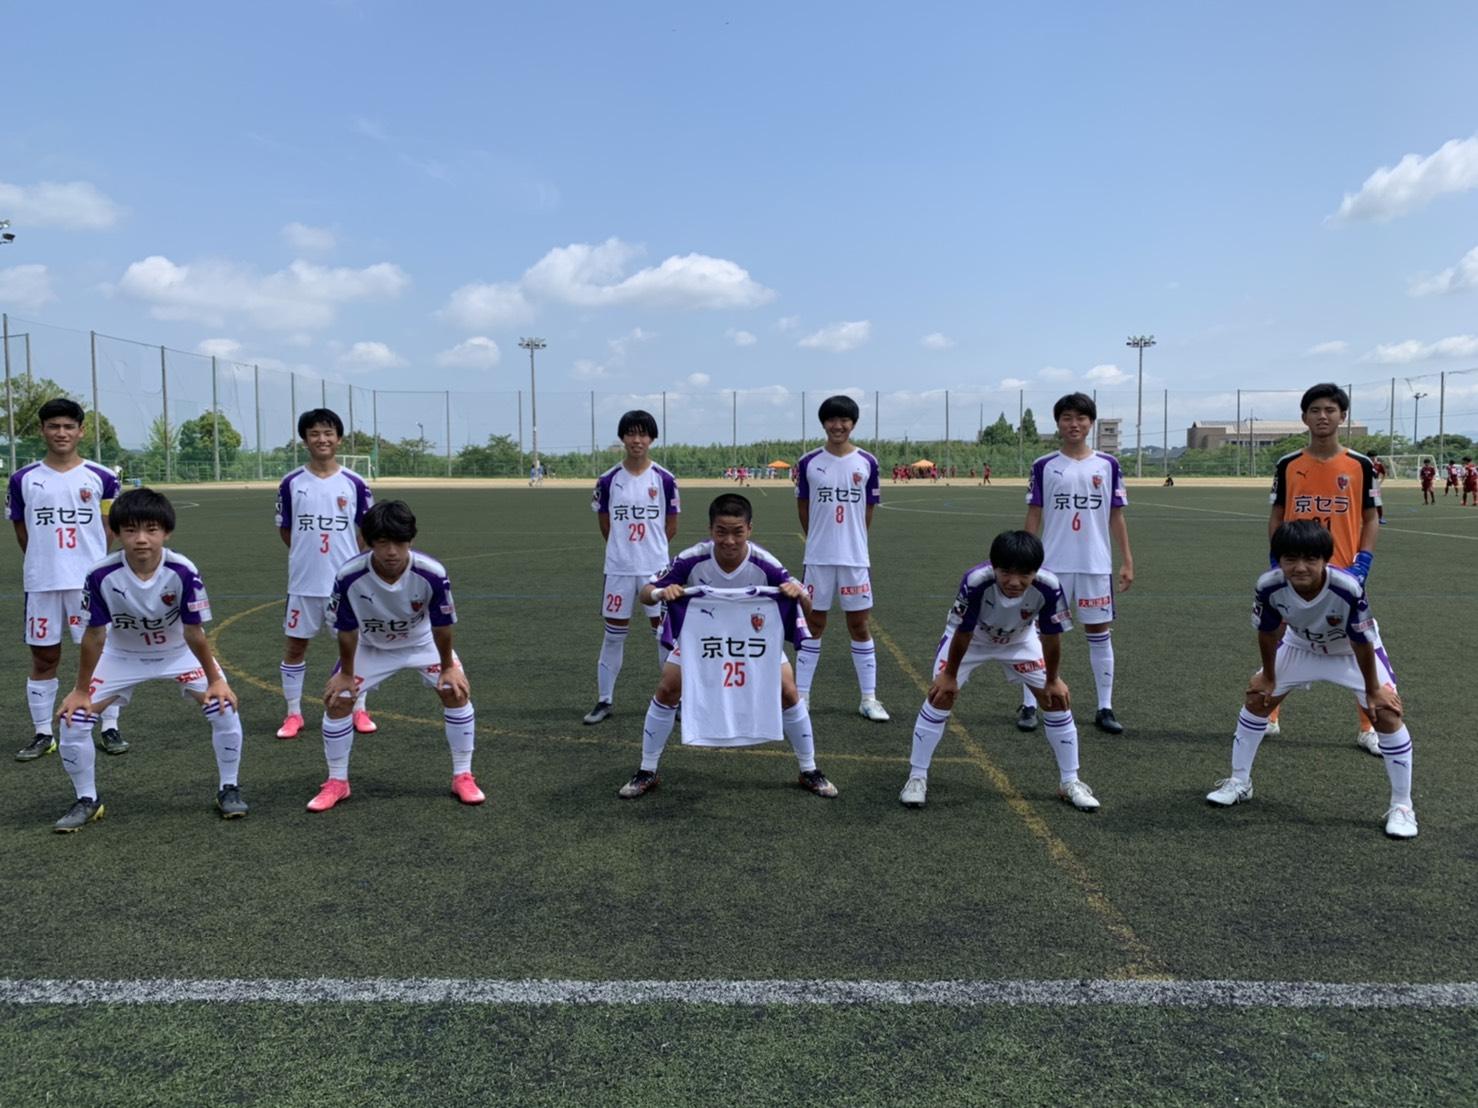 【U-15】高円宮杯JFA U-15サッカーリーグ滋賀2021 TOPリーグ第15節